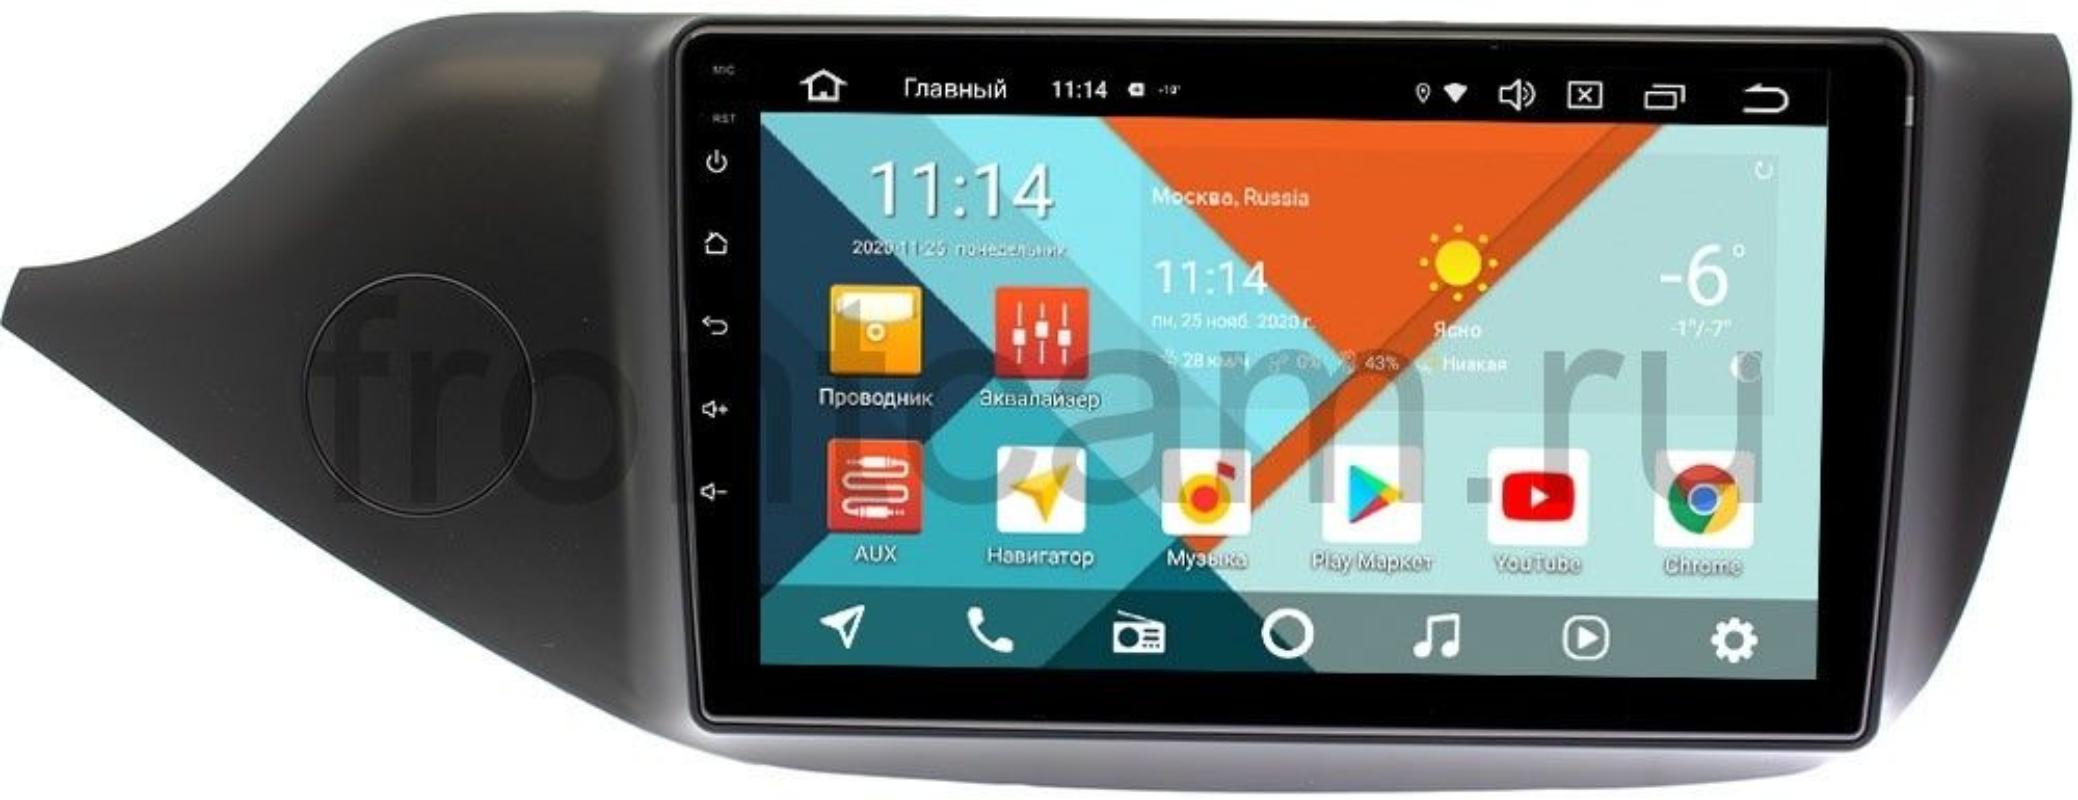 Штатная магнитола Kia Ceed II 2012-2018 (матовая) Wide Media KS9098QM-2/32 DSP CarPlay 4G-SIM Android 10 (+ Камера заднего вида в подарок!)